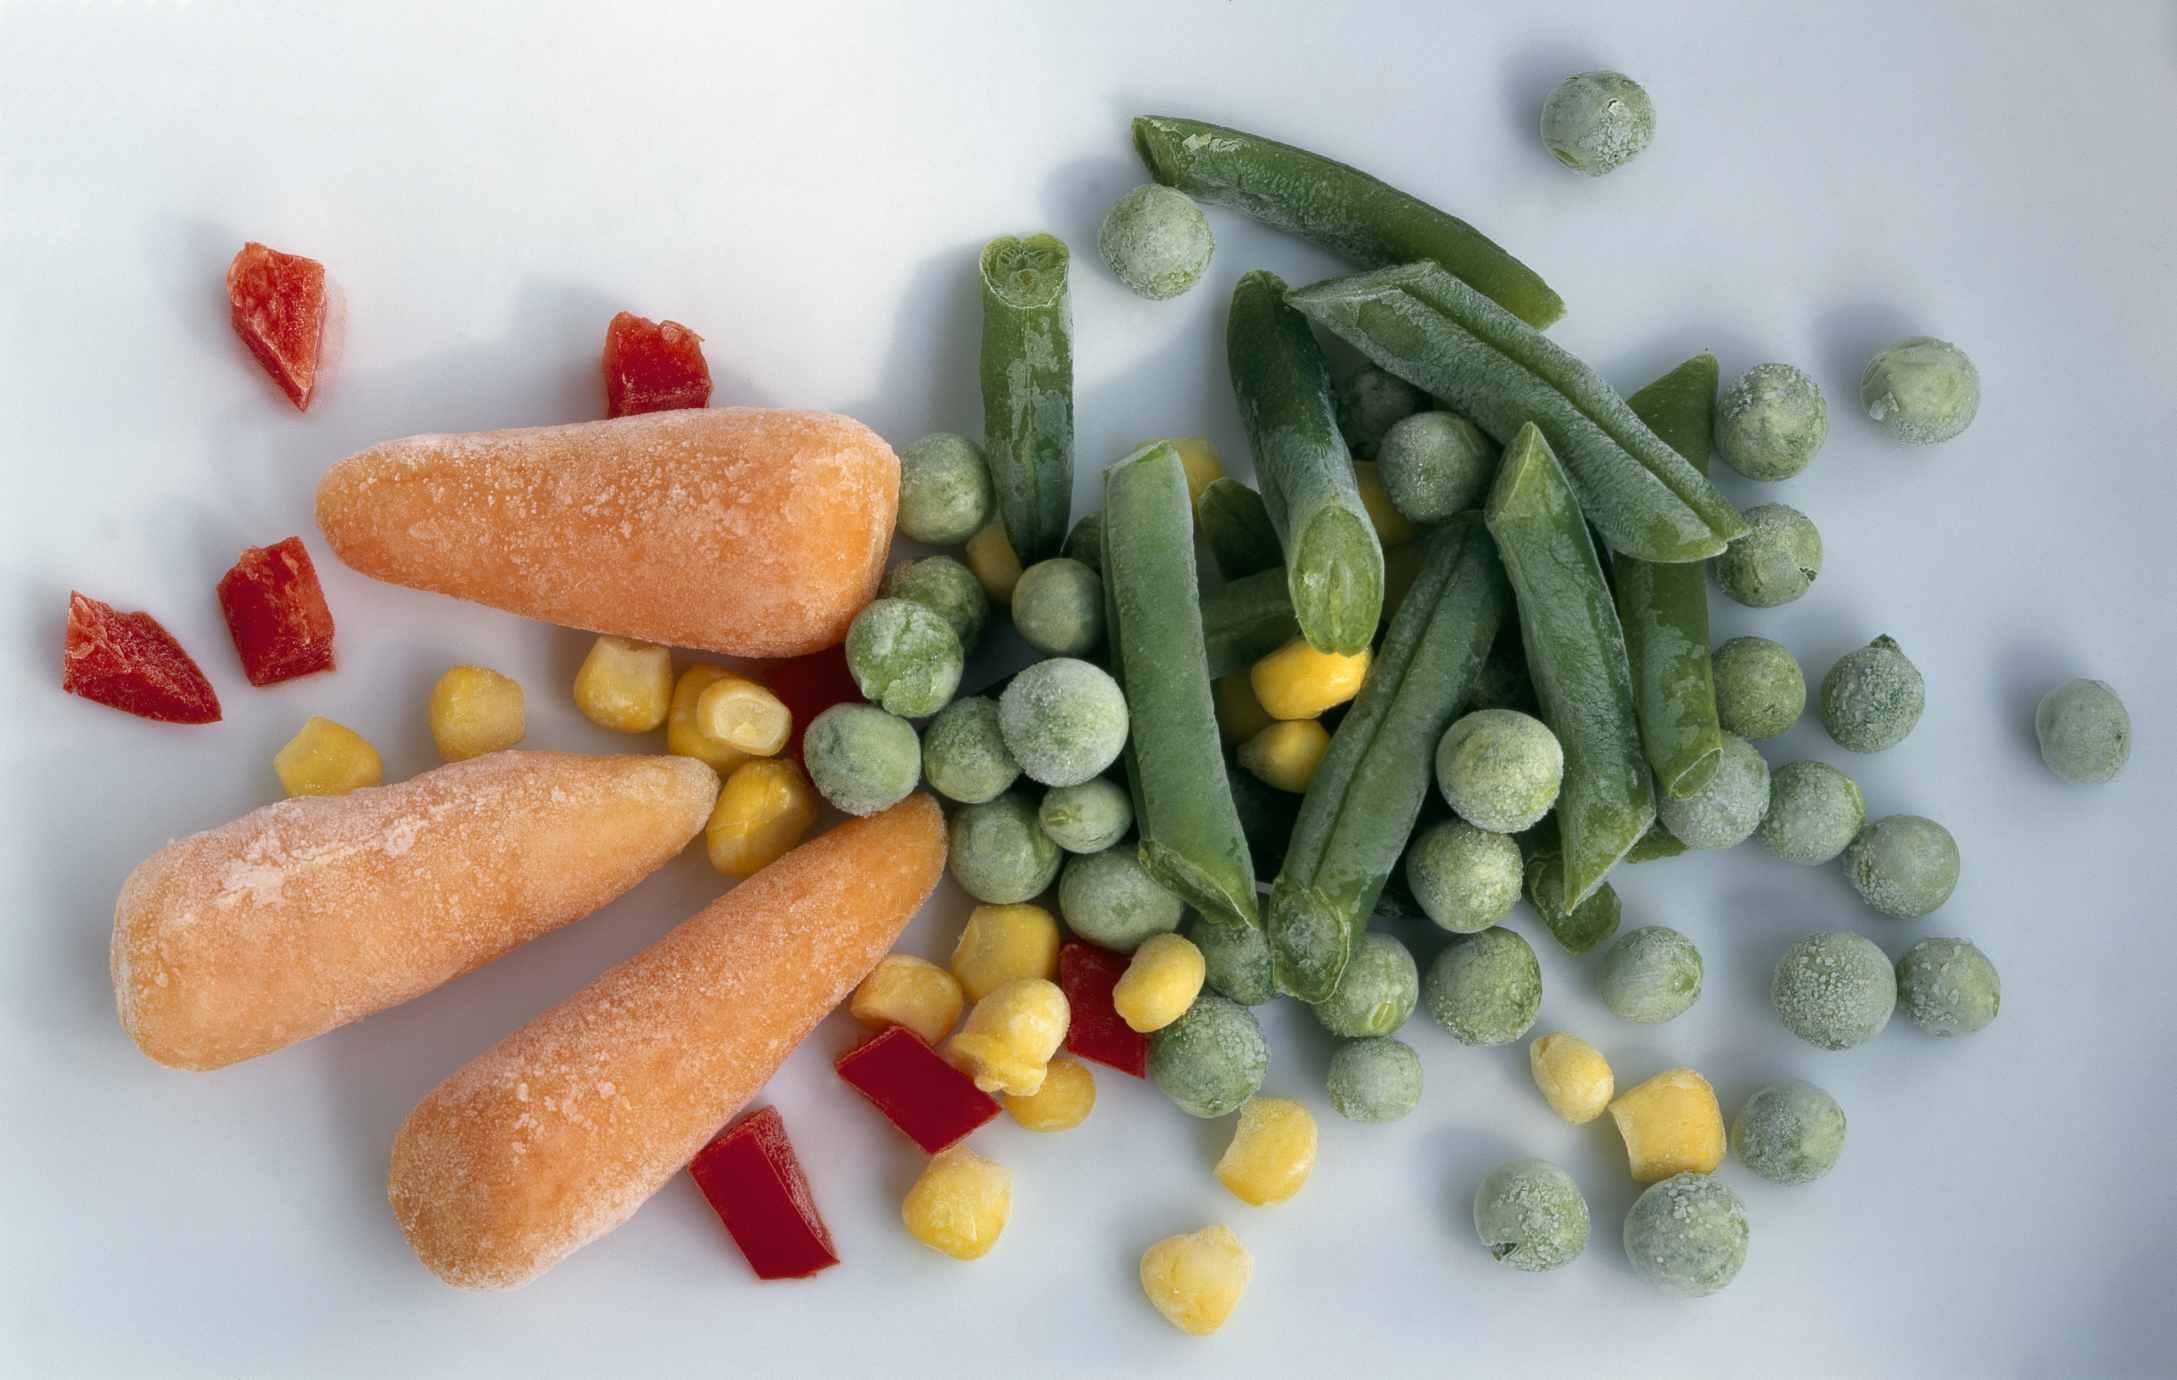 Frozen vegetables are good to buy in bulk.